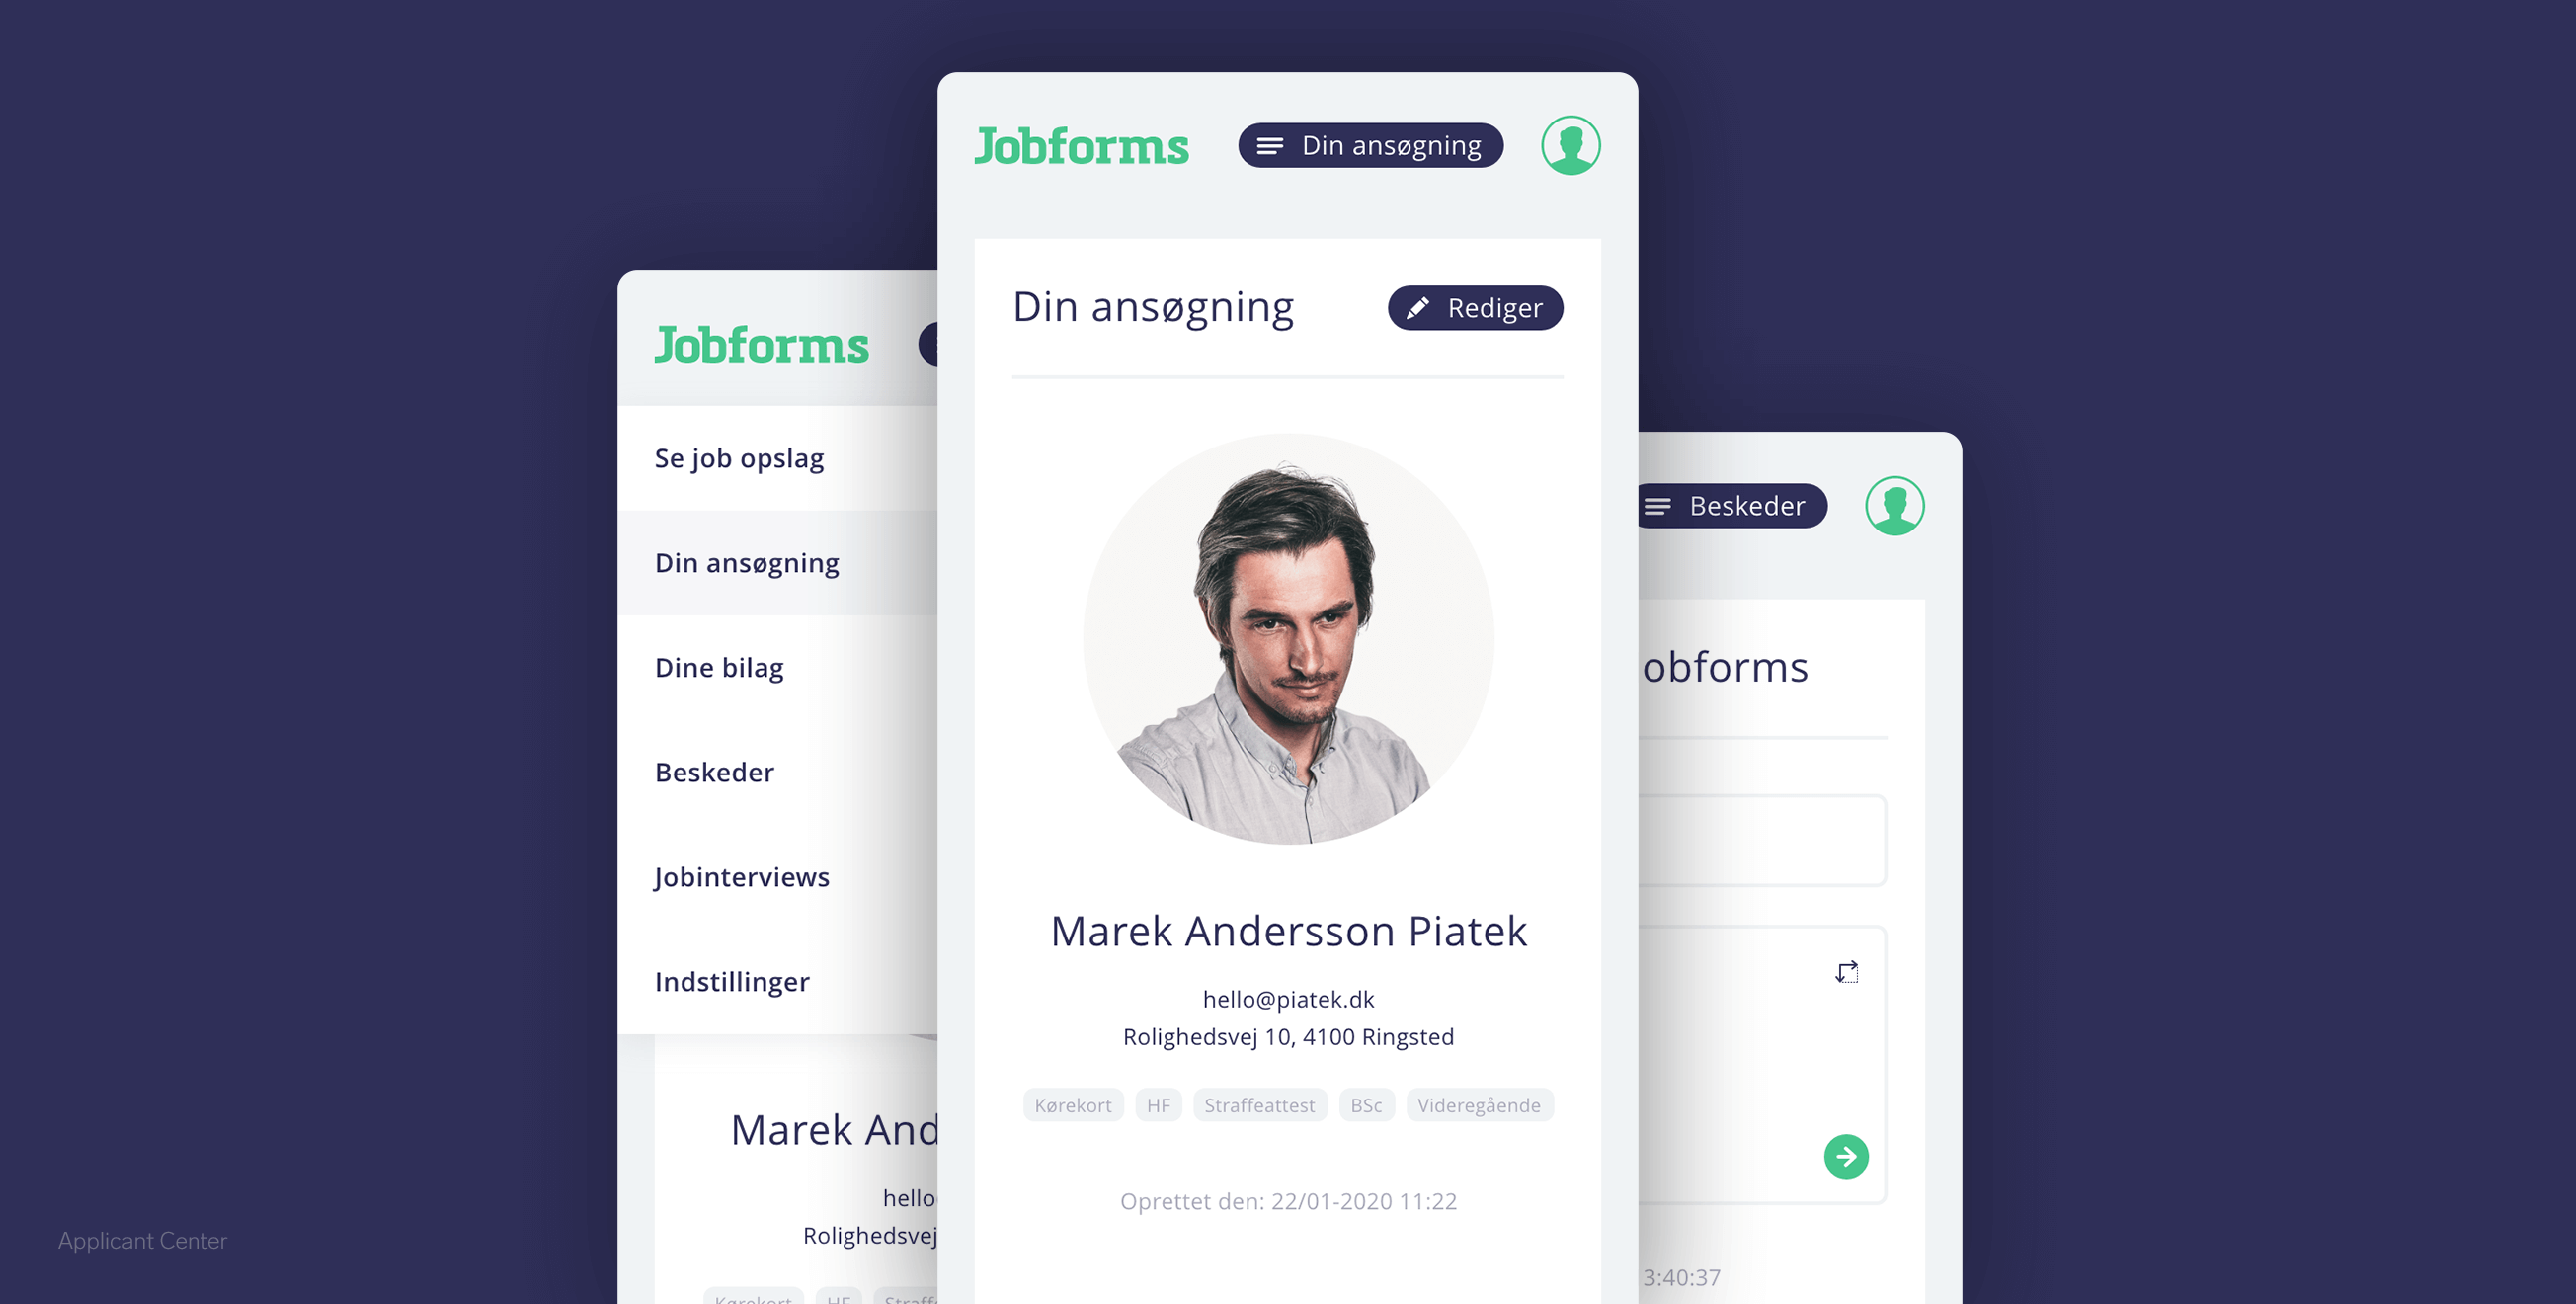 work__jobforms-12